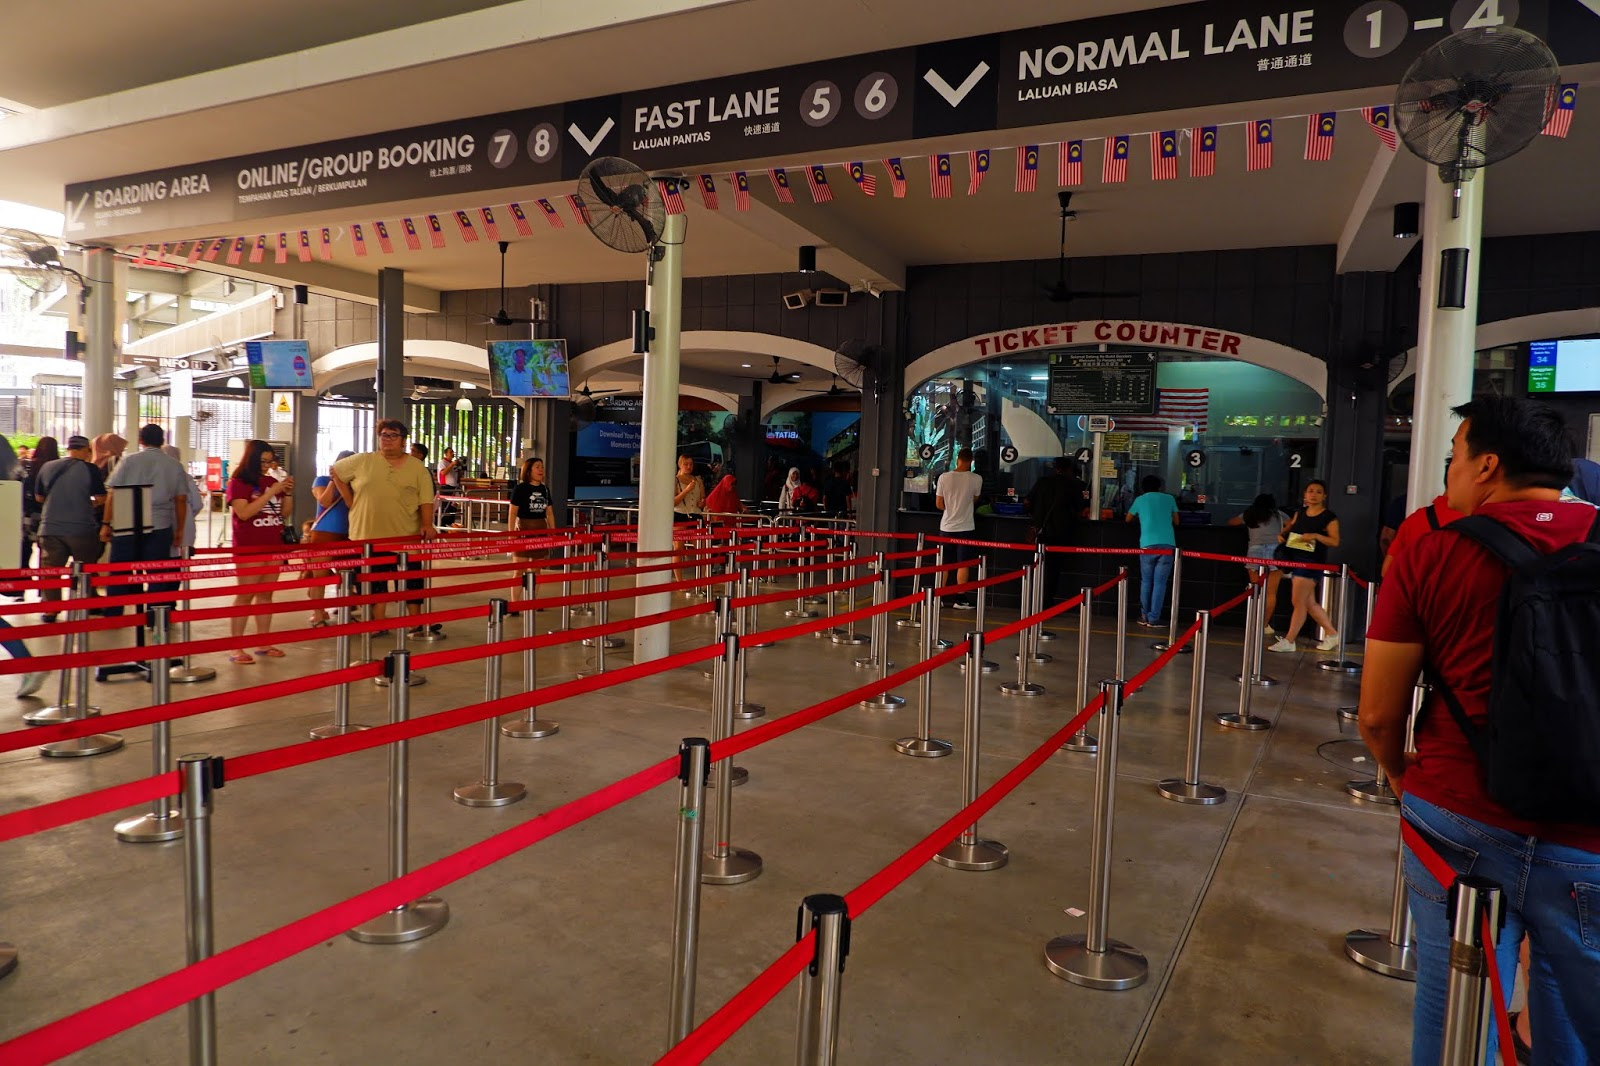 Ticketing-Counter-Penang-Hill.jpg